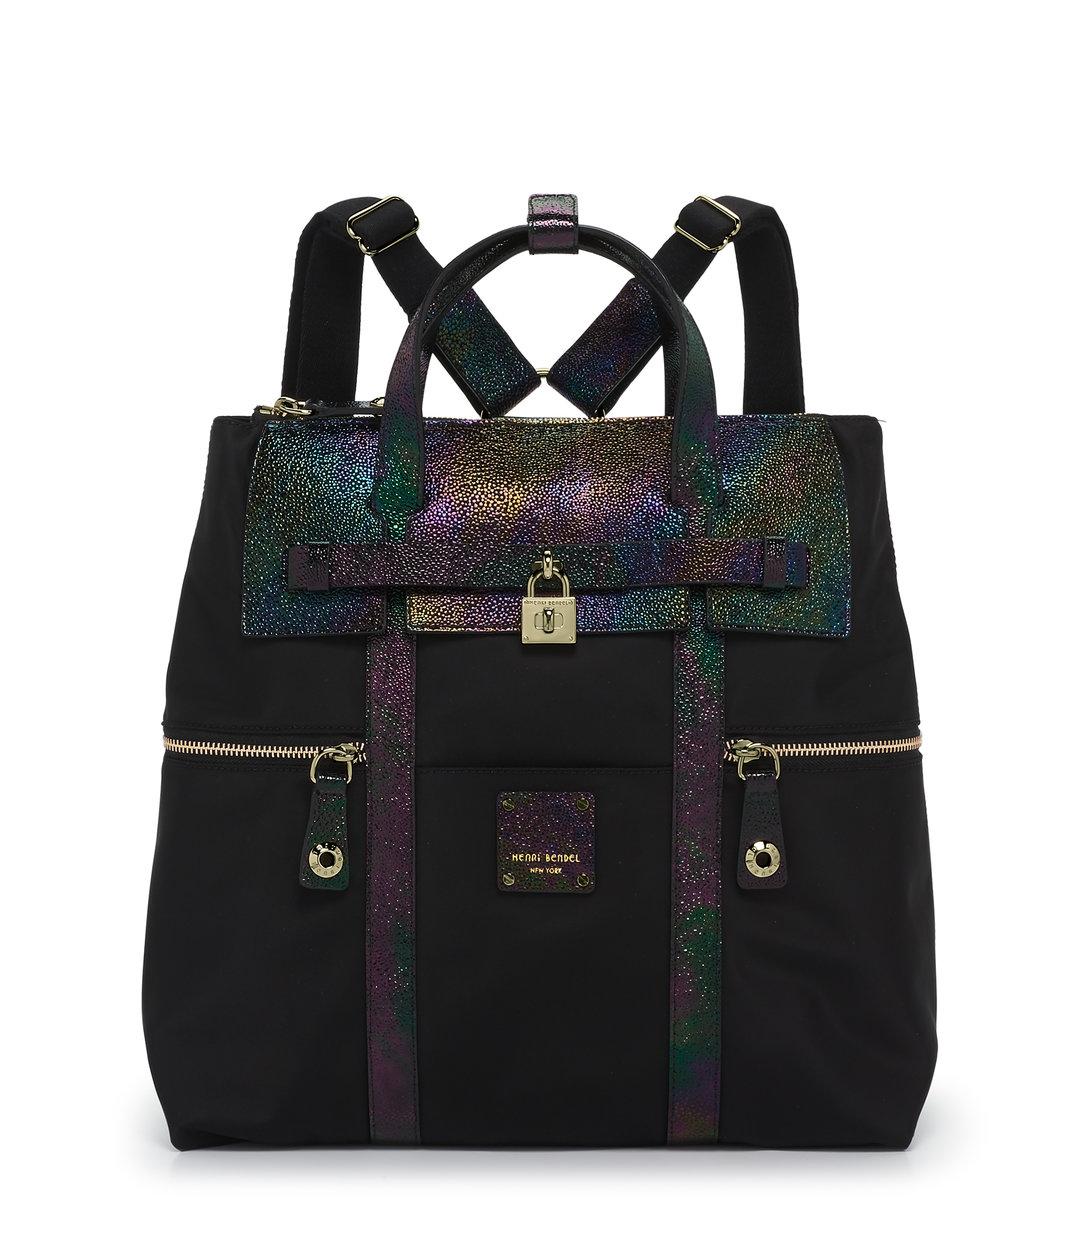 الـ back bag1